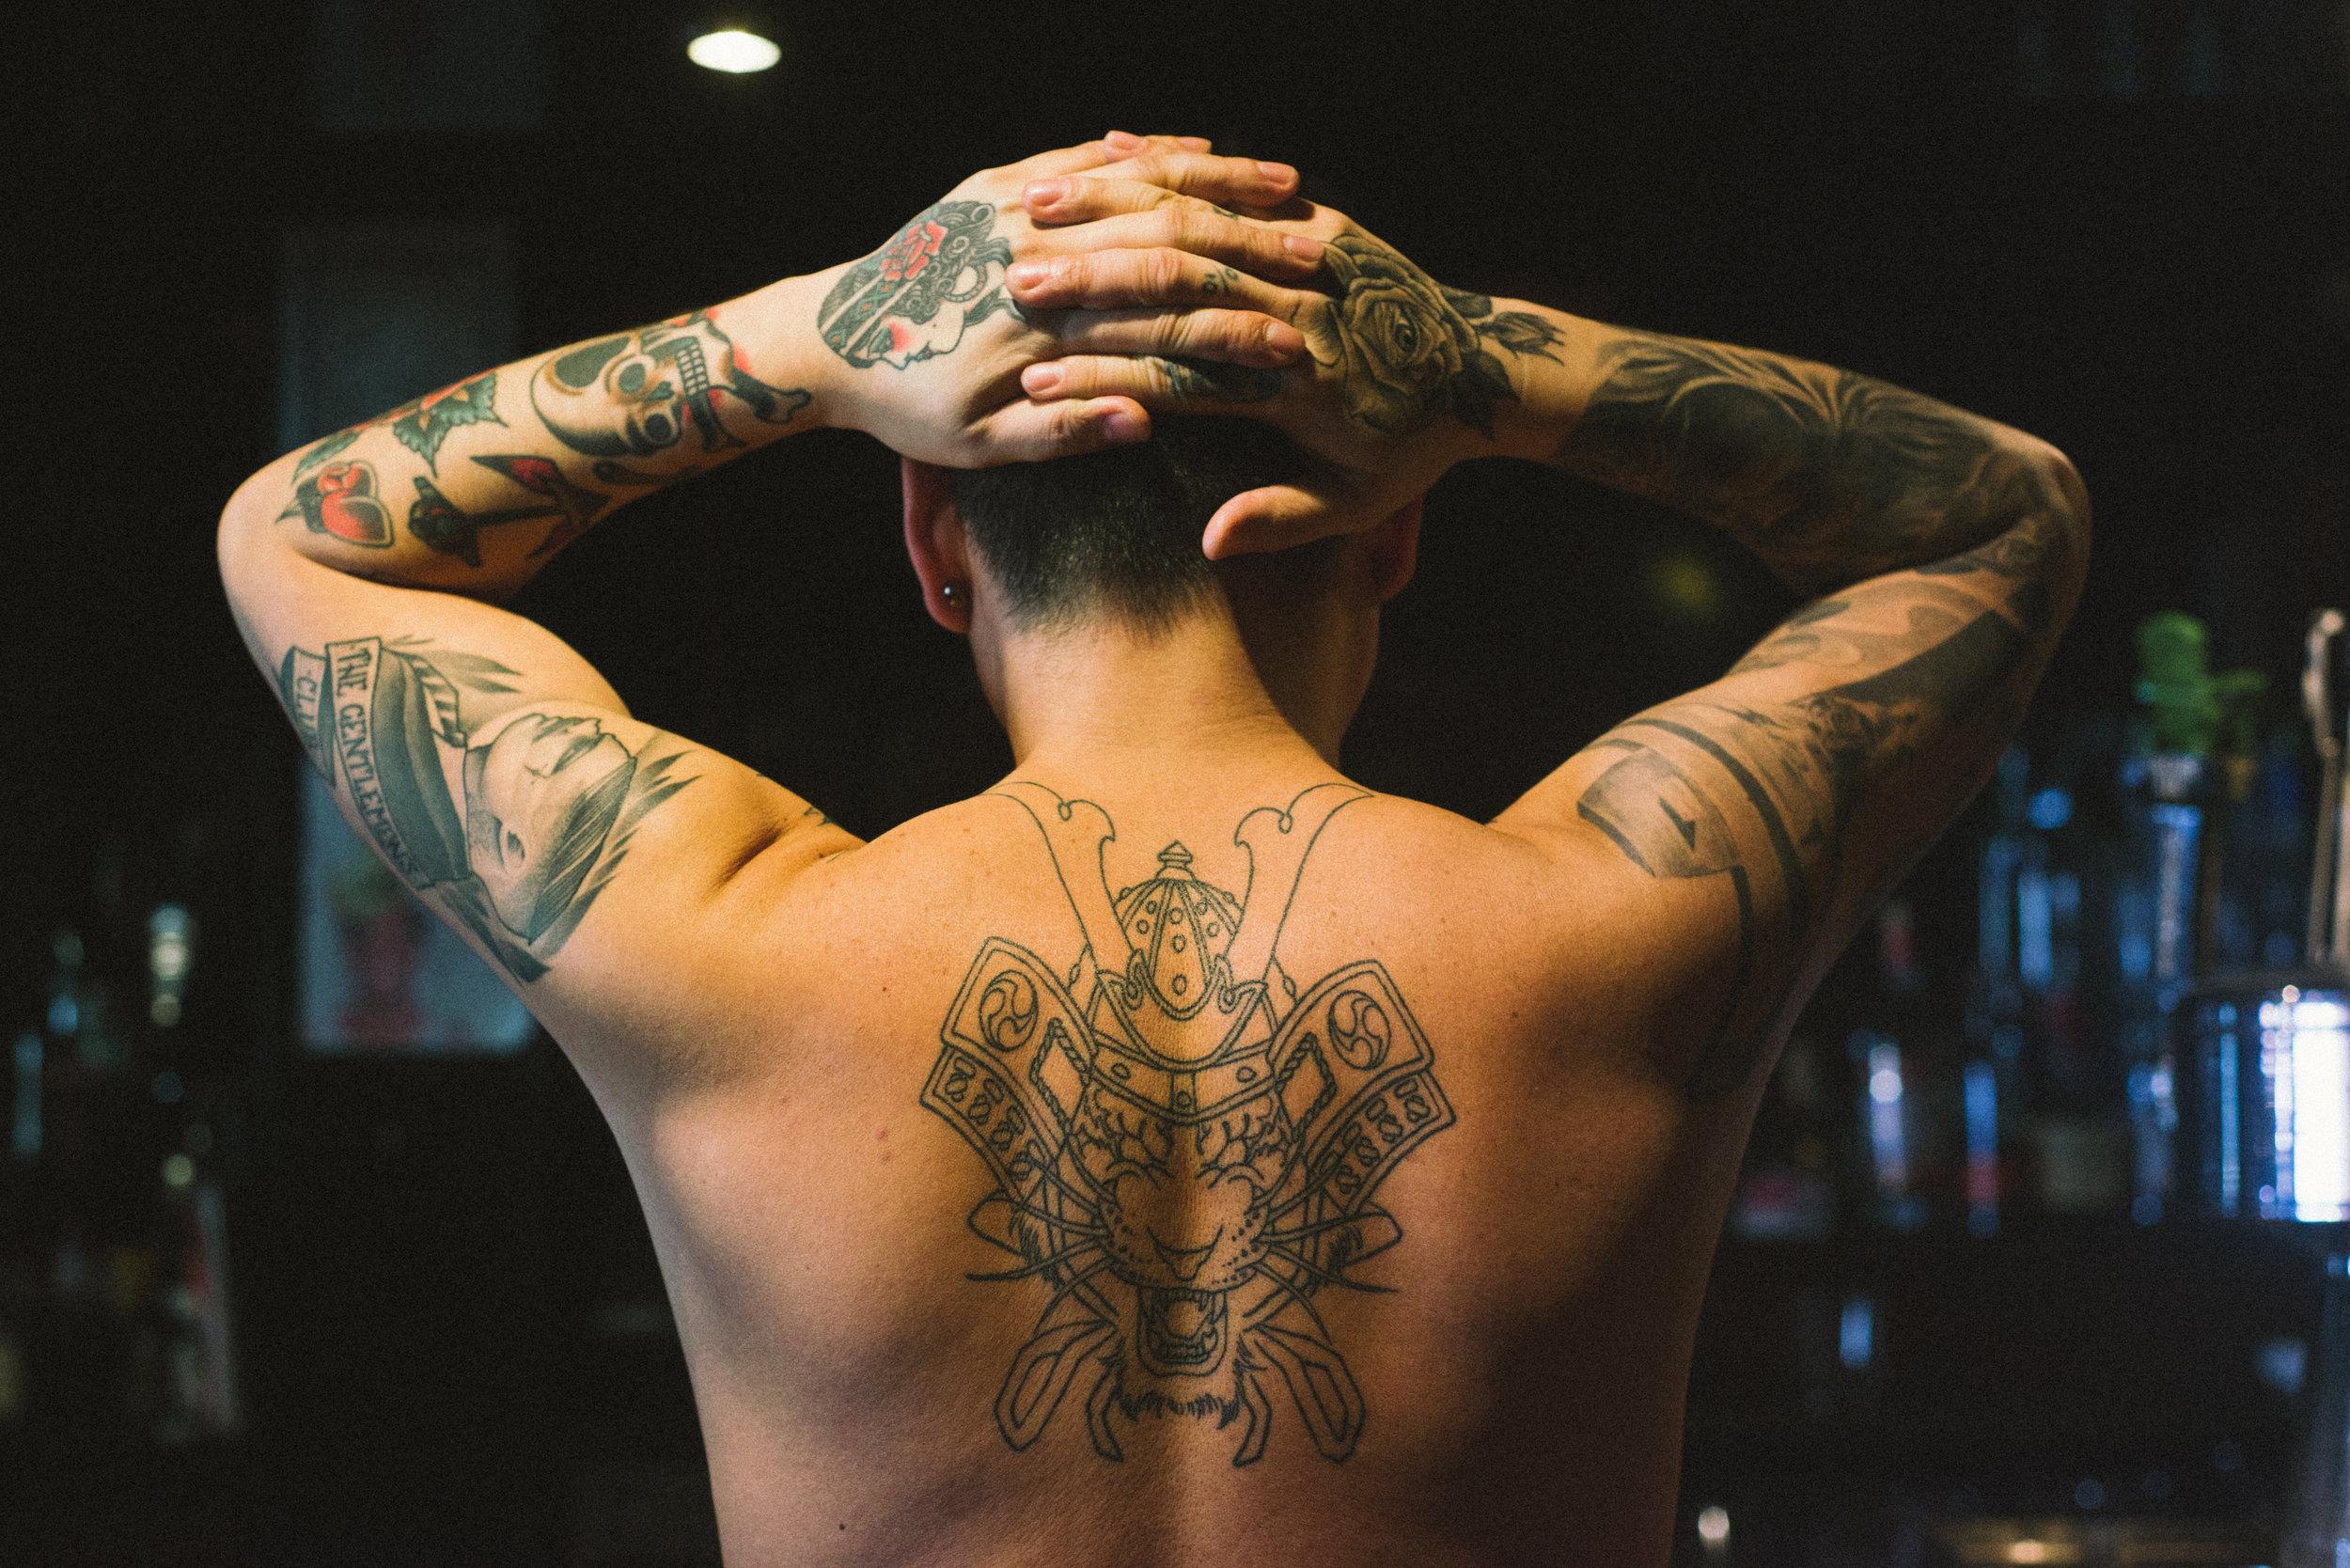 SUYT-Tattoo-Toronto-Adrenaline-Kris-Perez-Scandaleuse-9